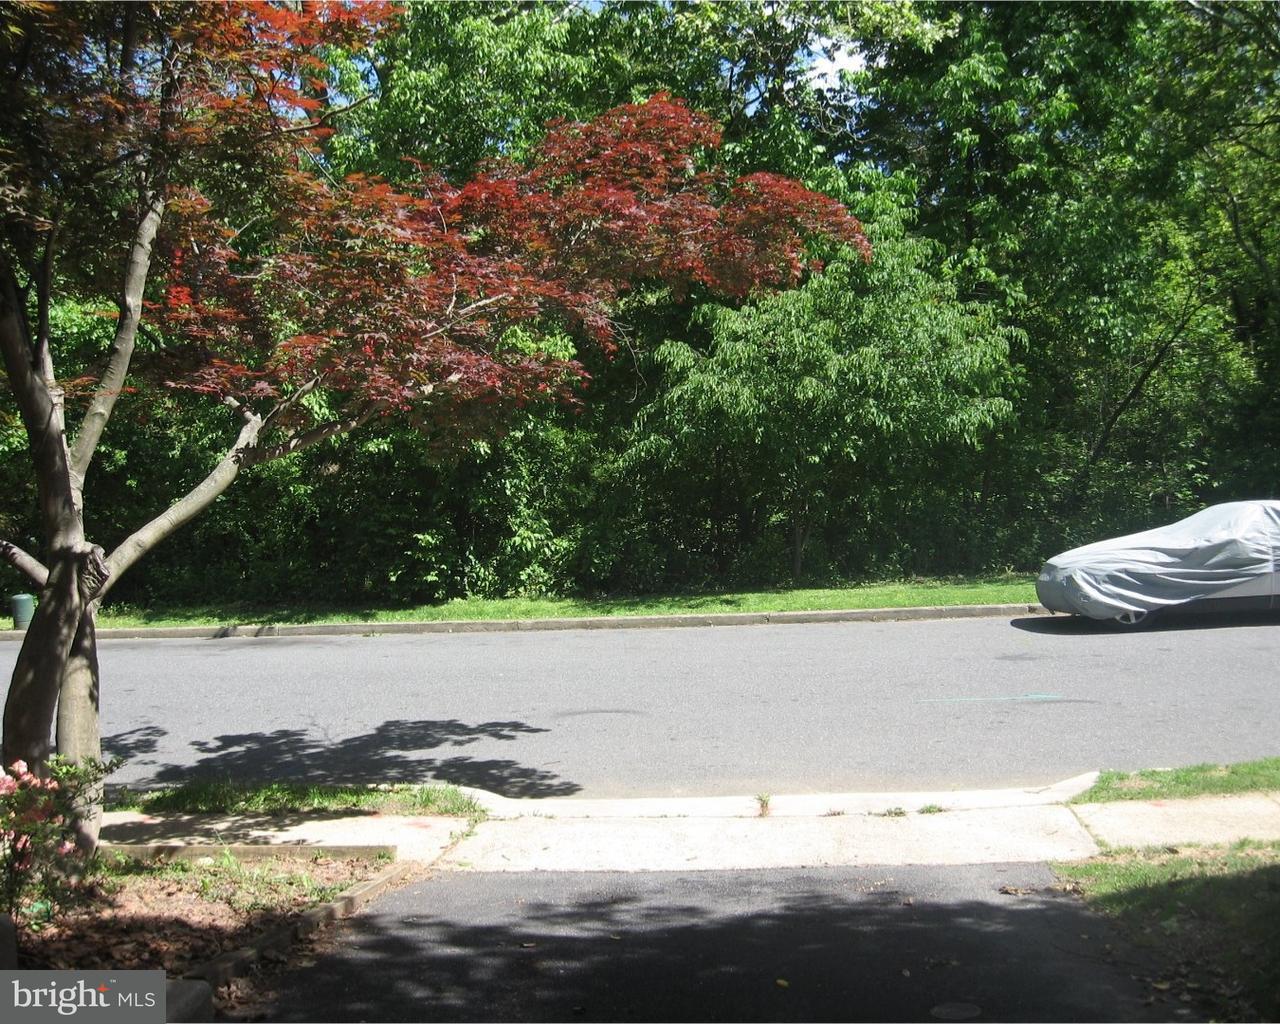 353 HILLSIDE RD, RIDLEY PARK - Listed at $189,900, RIDLEY PARK